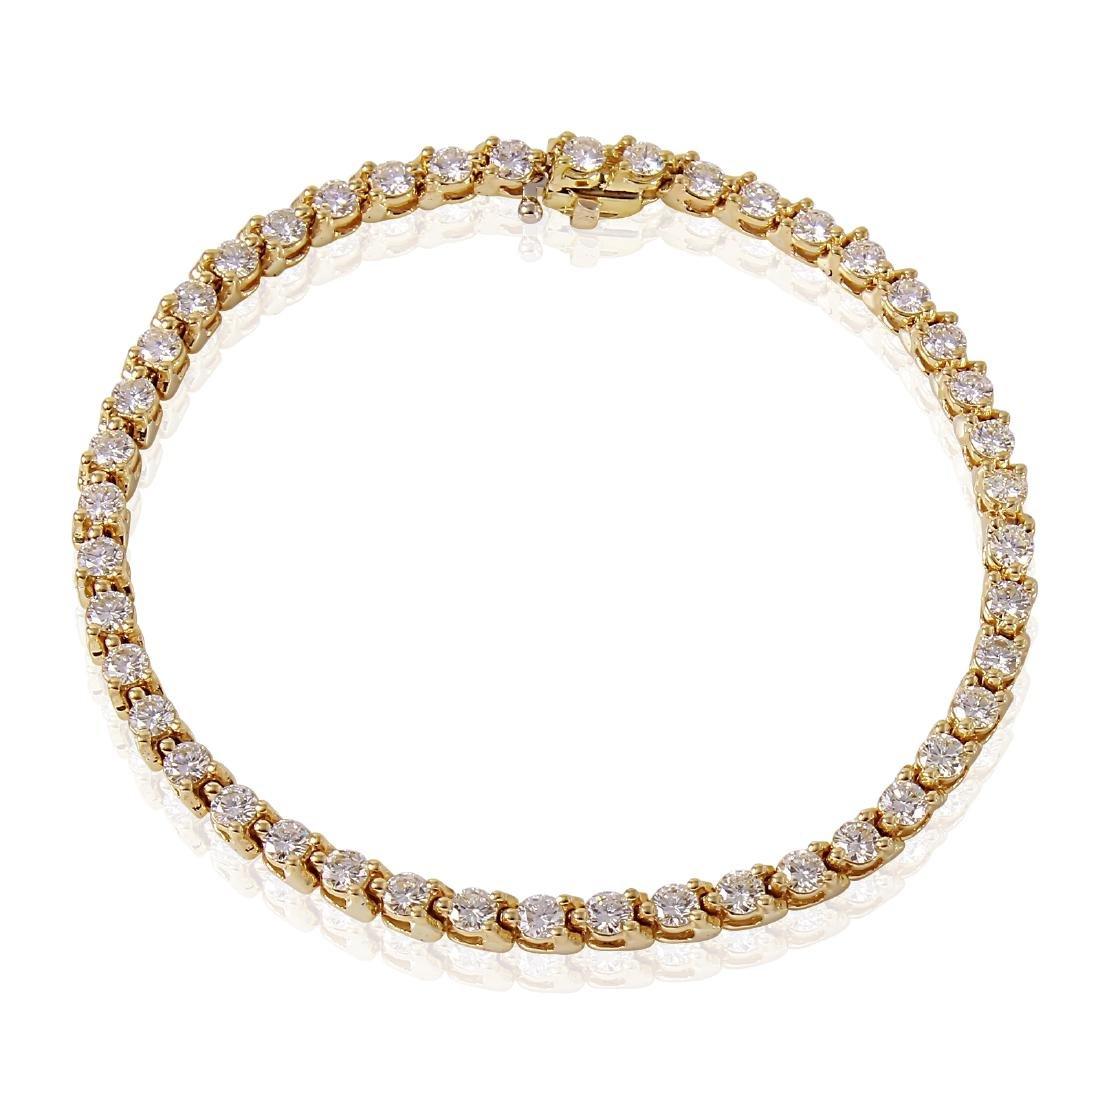 18KT Yellow Gold Diamond Tennis Bracelet